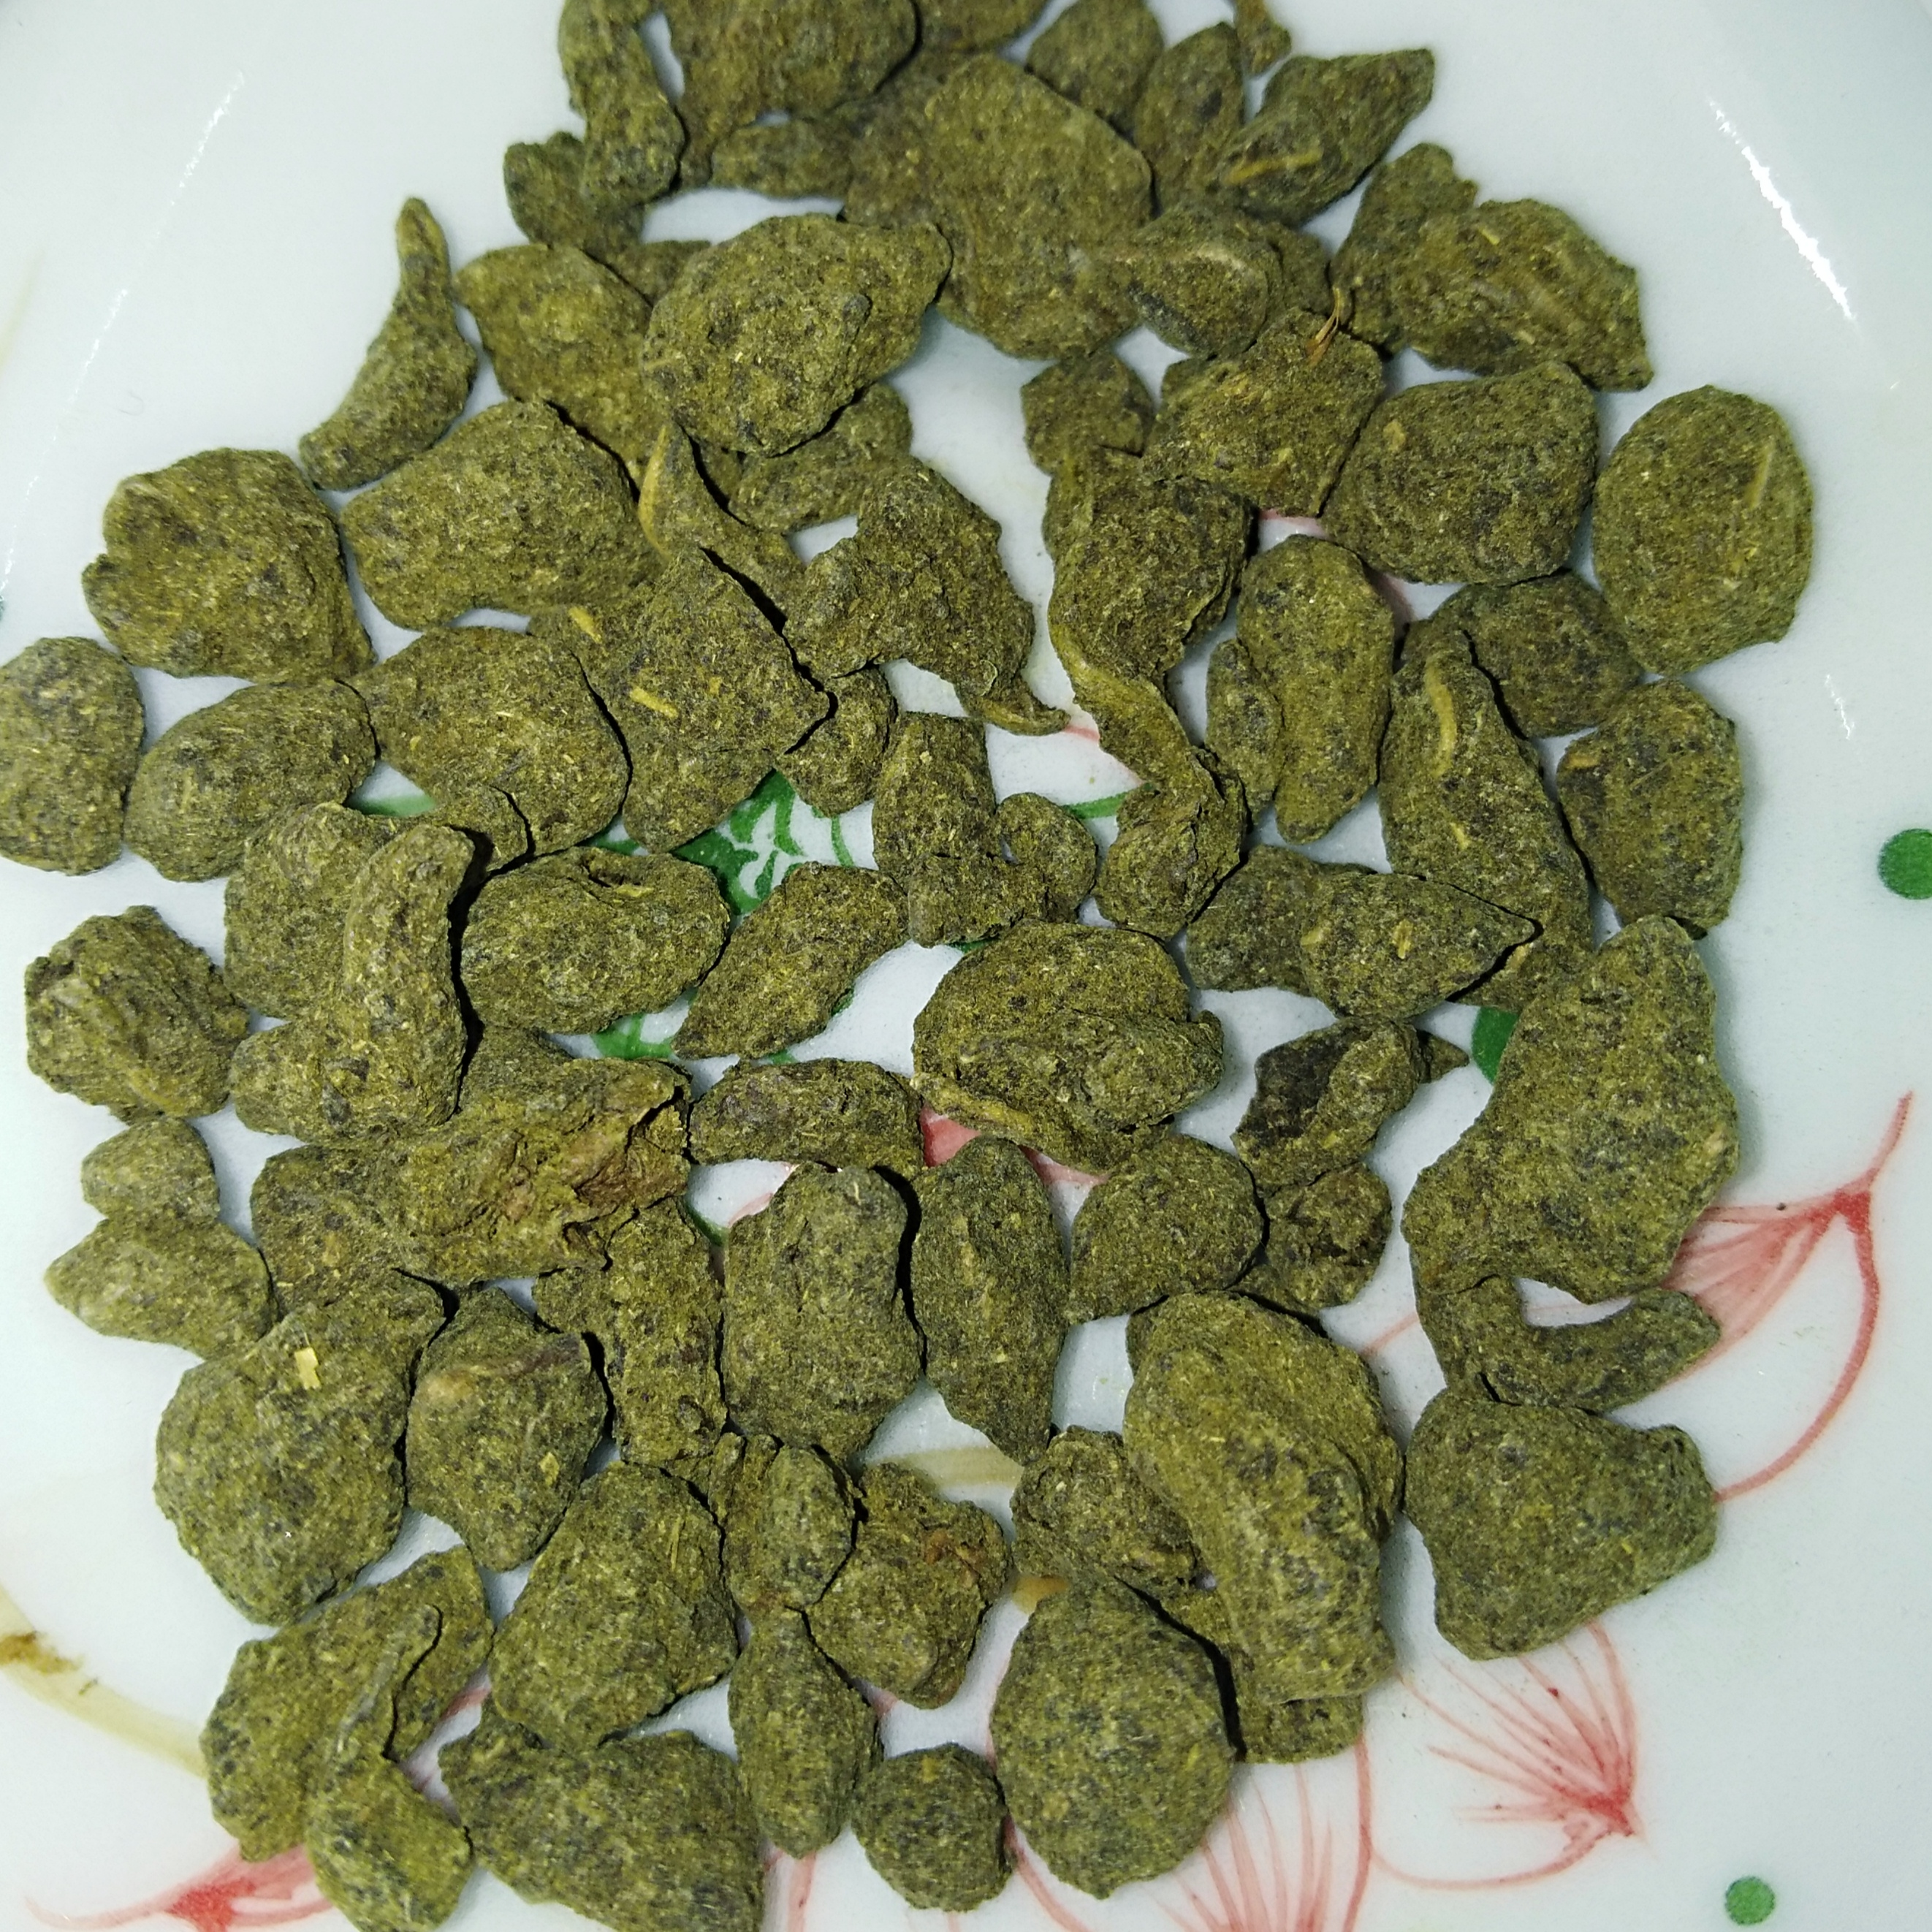 Chinese Oolong Tea EU Standard High Mountain Organic Quality Fujian Ginseng Oolong Tea - 4uTea | 4uTea.com